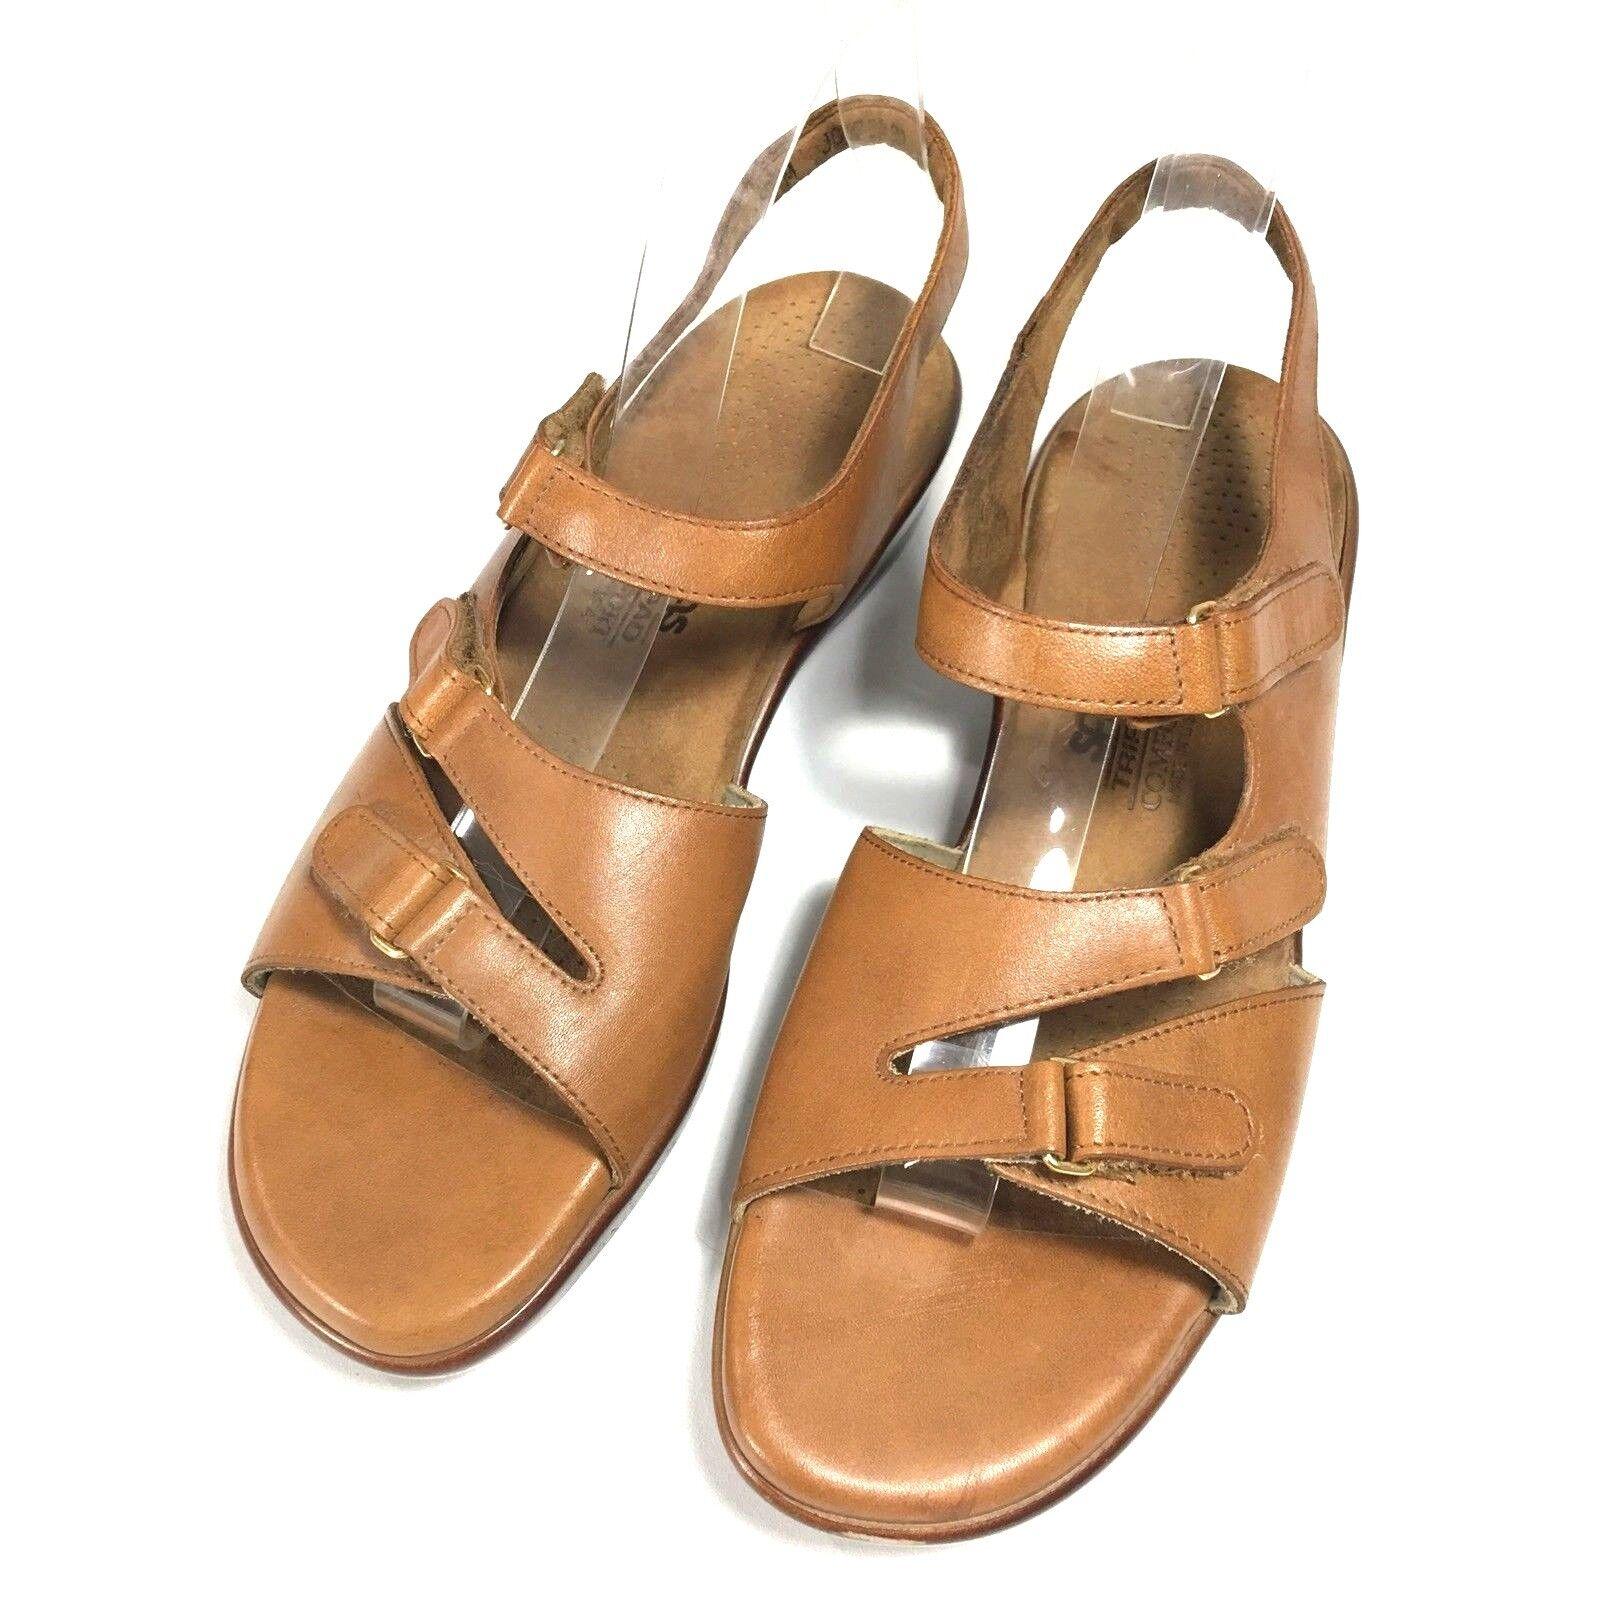 SAS Tripad Comfort Womens Tabby Caramel Brown Strappy Sandal US 10 M